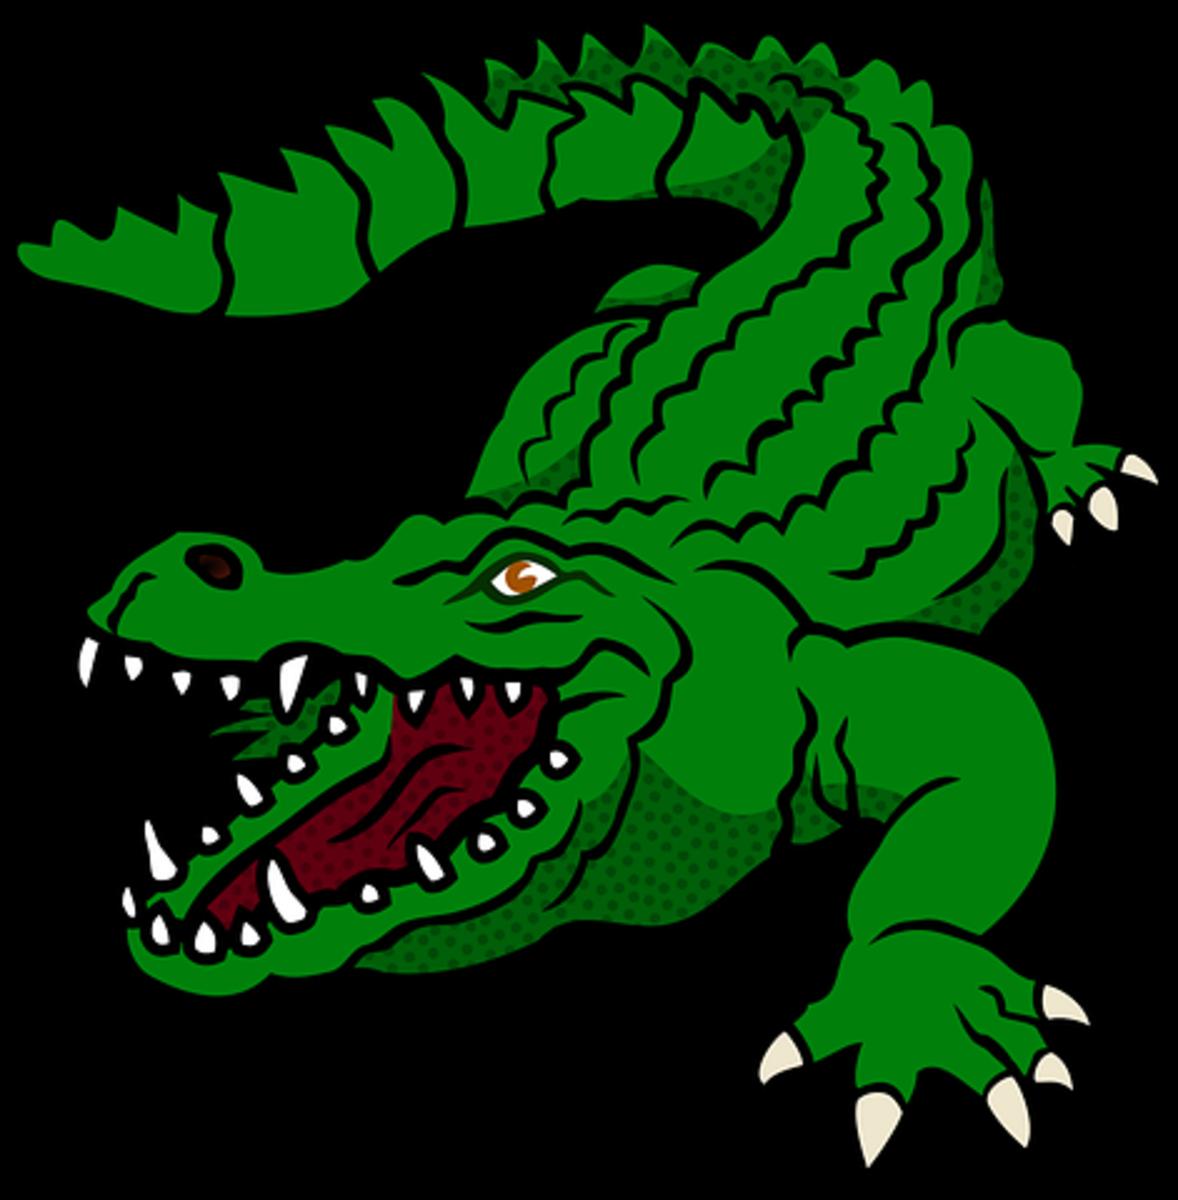 crocodile-tears-poetry